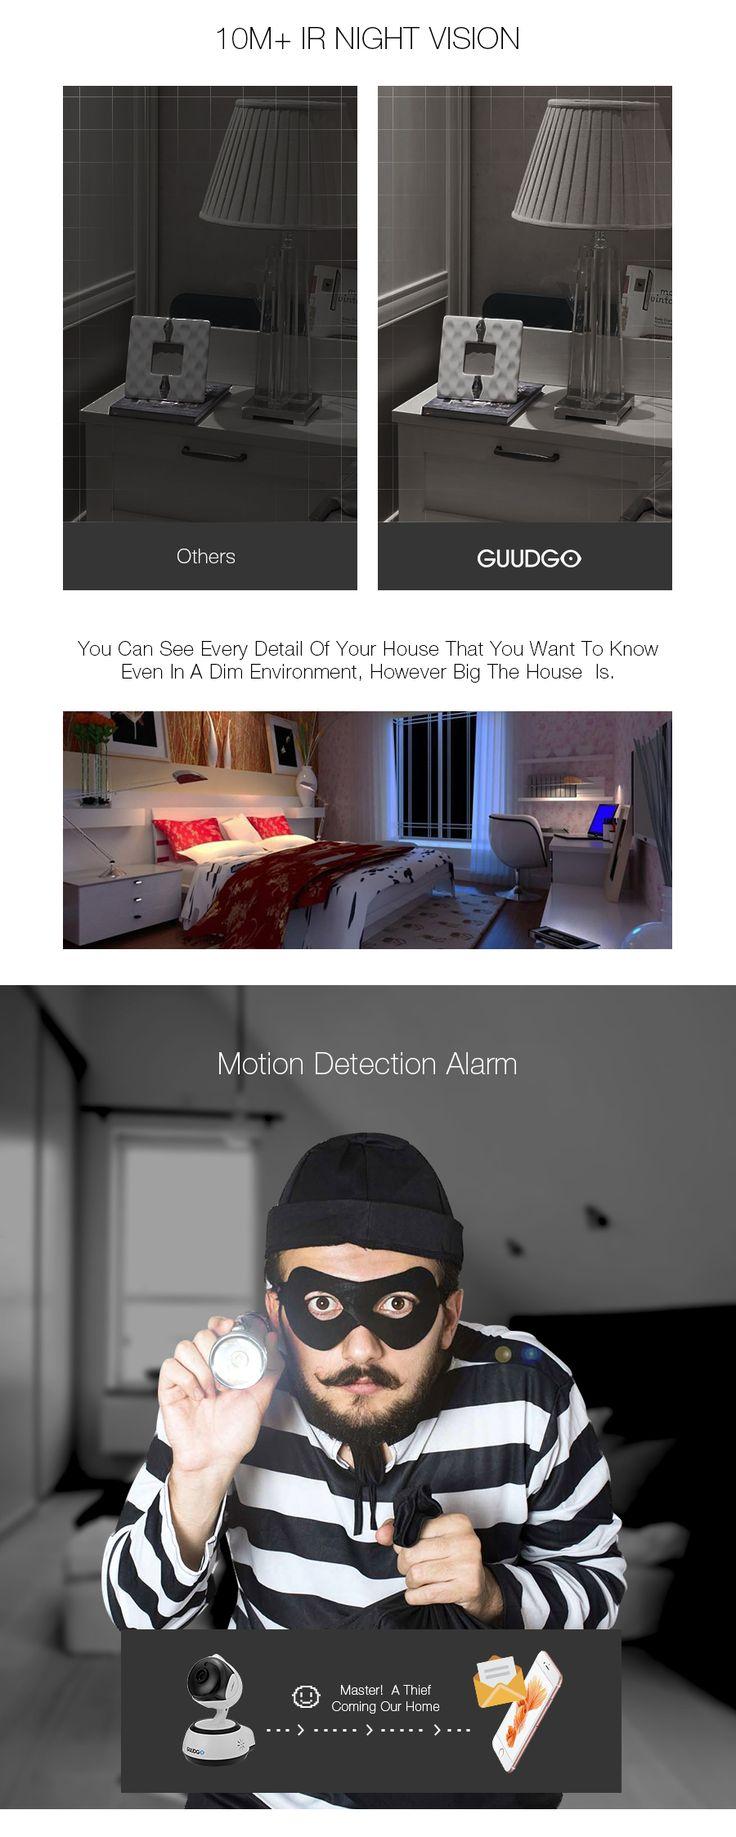 GUUDGO GD-SC02 720P Cloud Wifi IP Camera Pan&Tilt IR-Cut Night Vision Two-way Audio Motion Detection Alarm Camera Monitor Support Amazon-AWS[Amazon Web Services] Cloud Storage Service